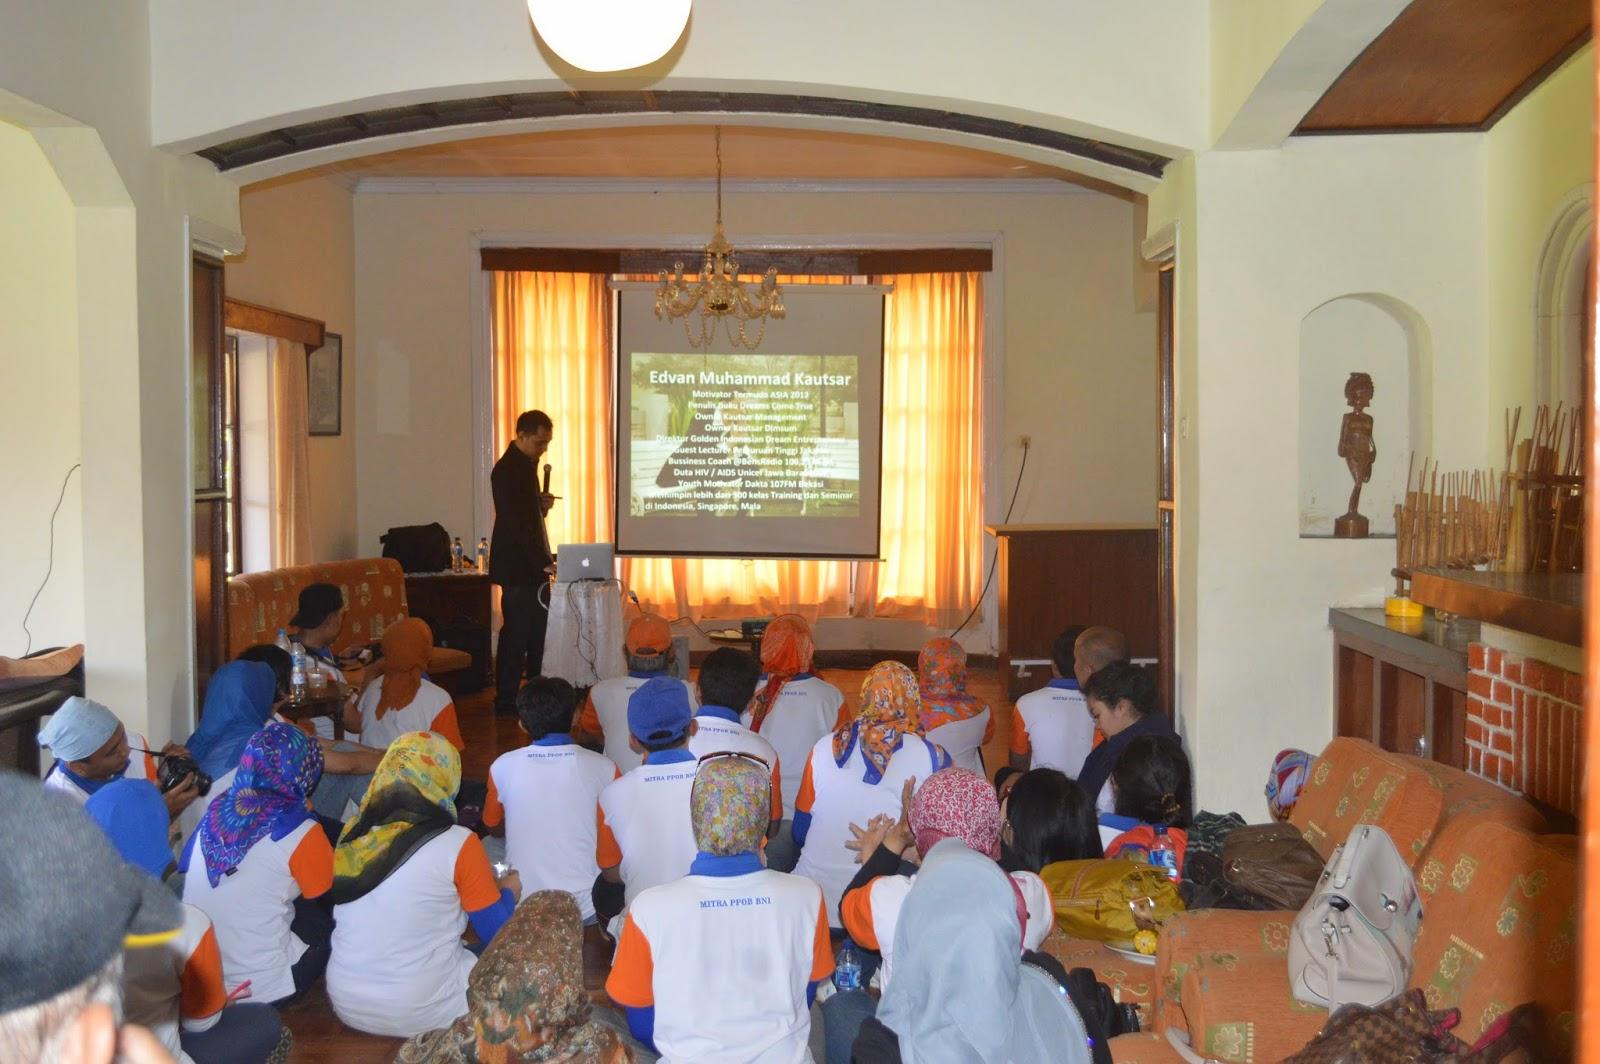 motivator muda, motivator indonesia, edvan m kautsar, seminar, outbond, motivasi outbond, pembicara motivasi, inspirator muda, motivator indonesia